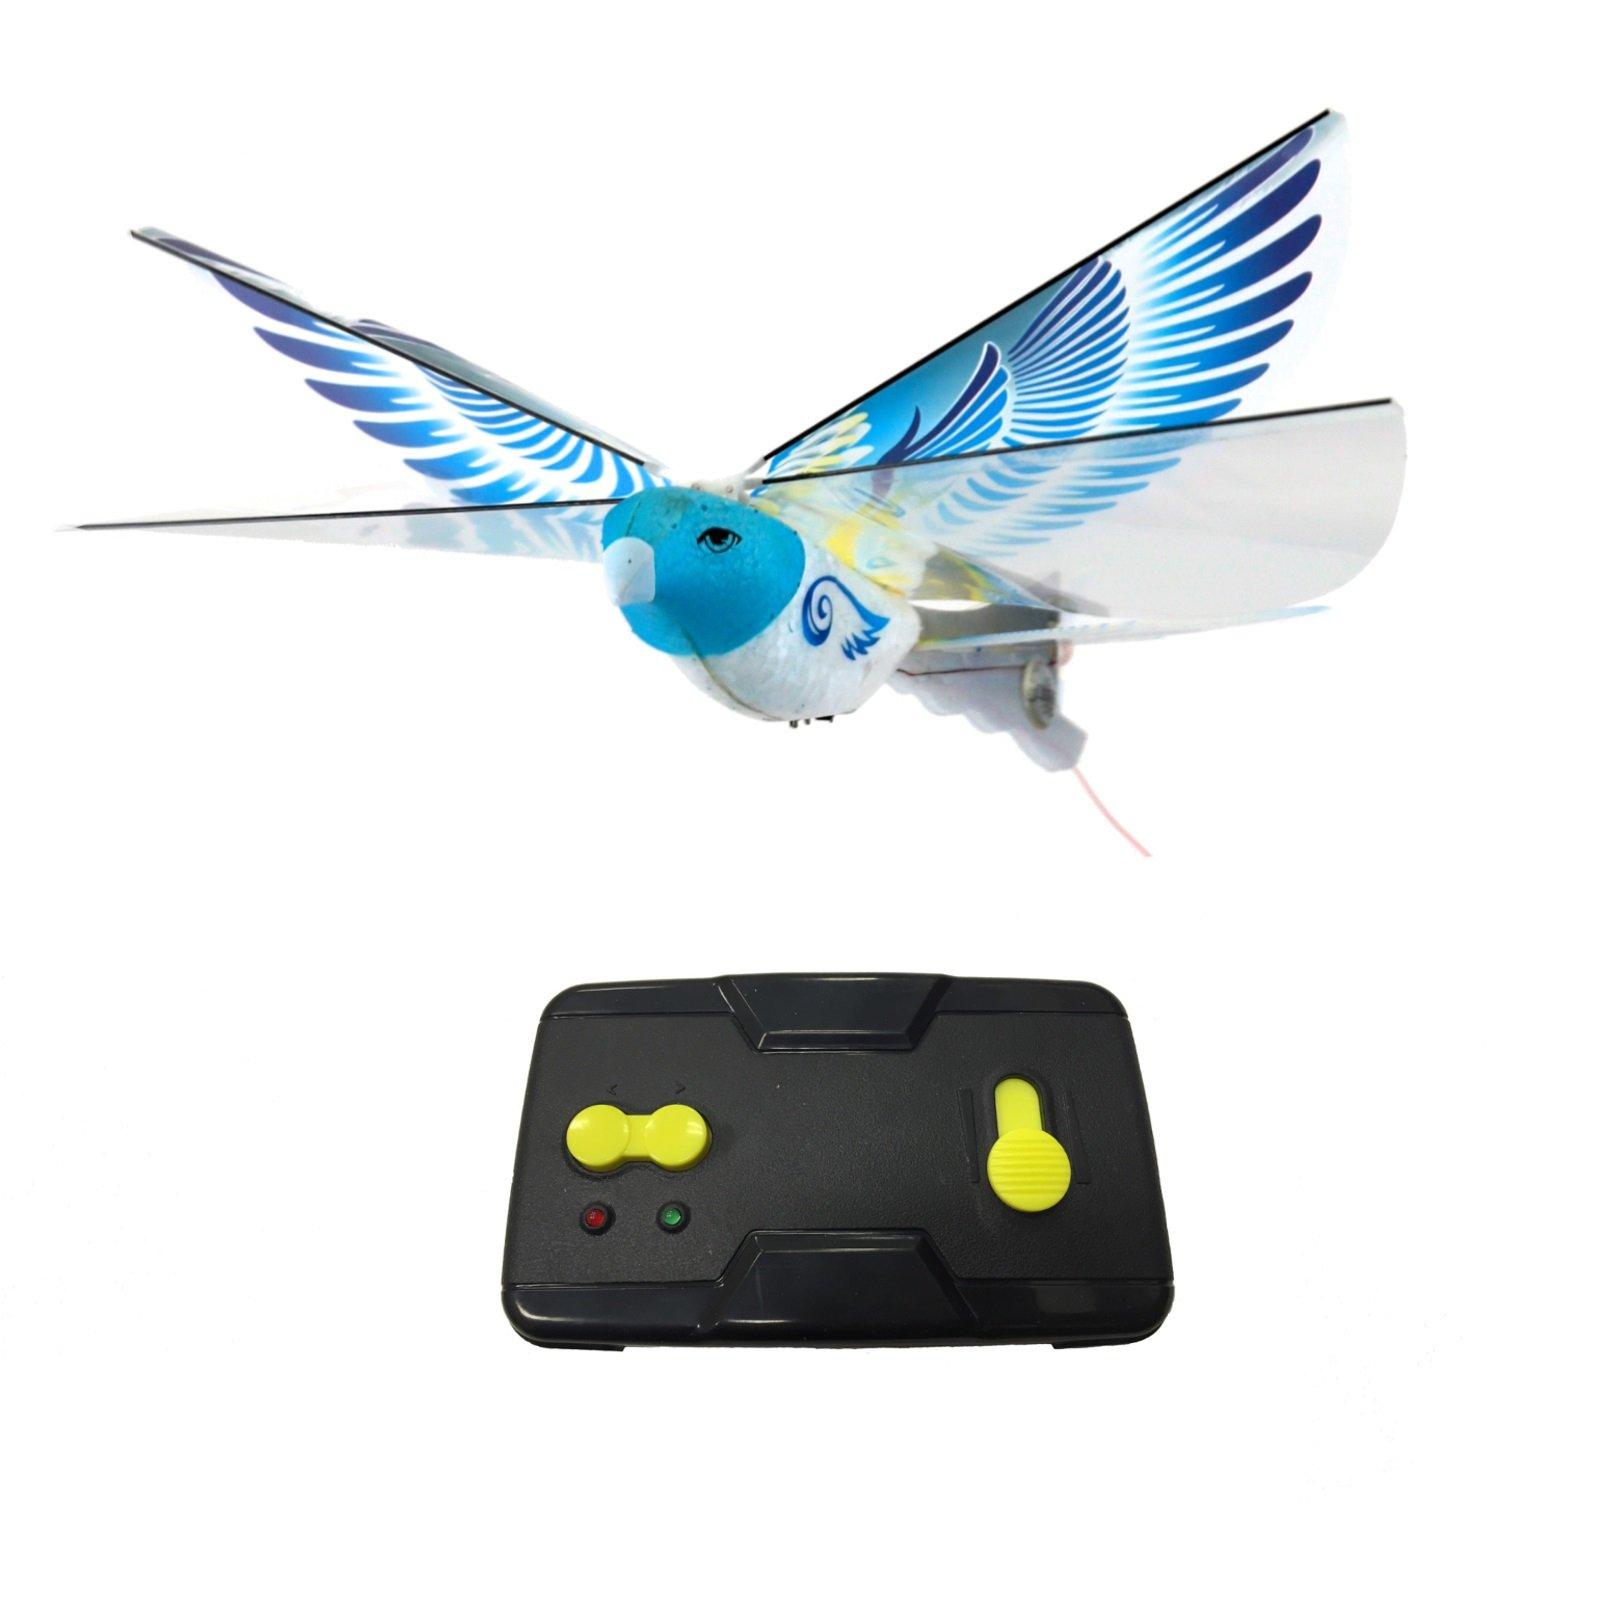 MukikiM eBird Blue Pigeon - 2016 Creative Child Preferred Choice Award Winning Flying RC Toy - Remote Control Bionic Bird (Newest 2.4GHz Version Featuring USB Charging) by MukikiM